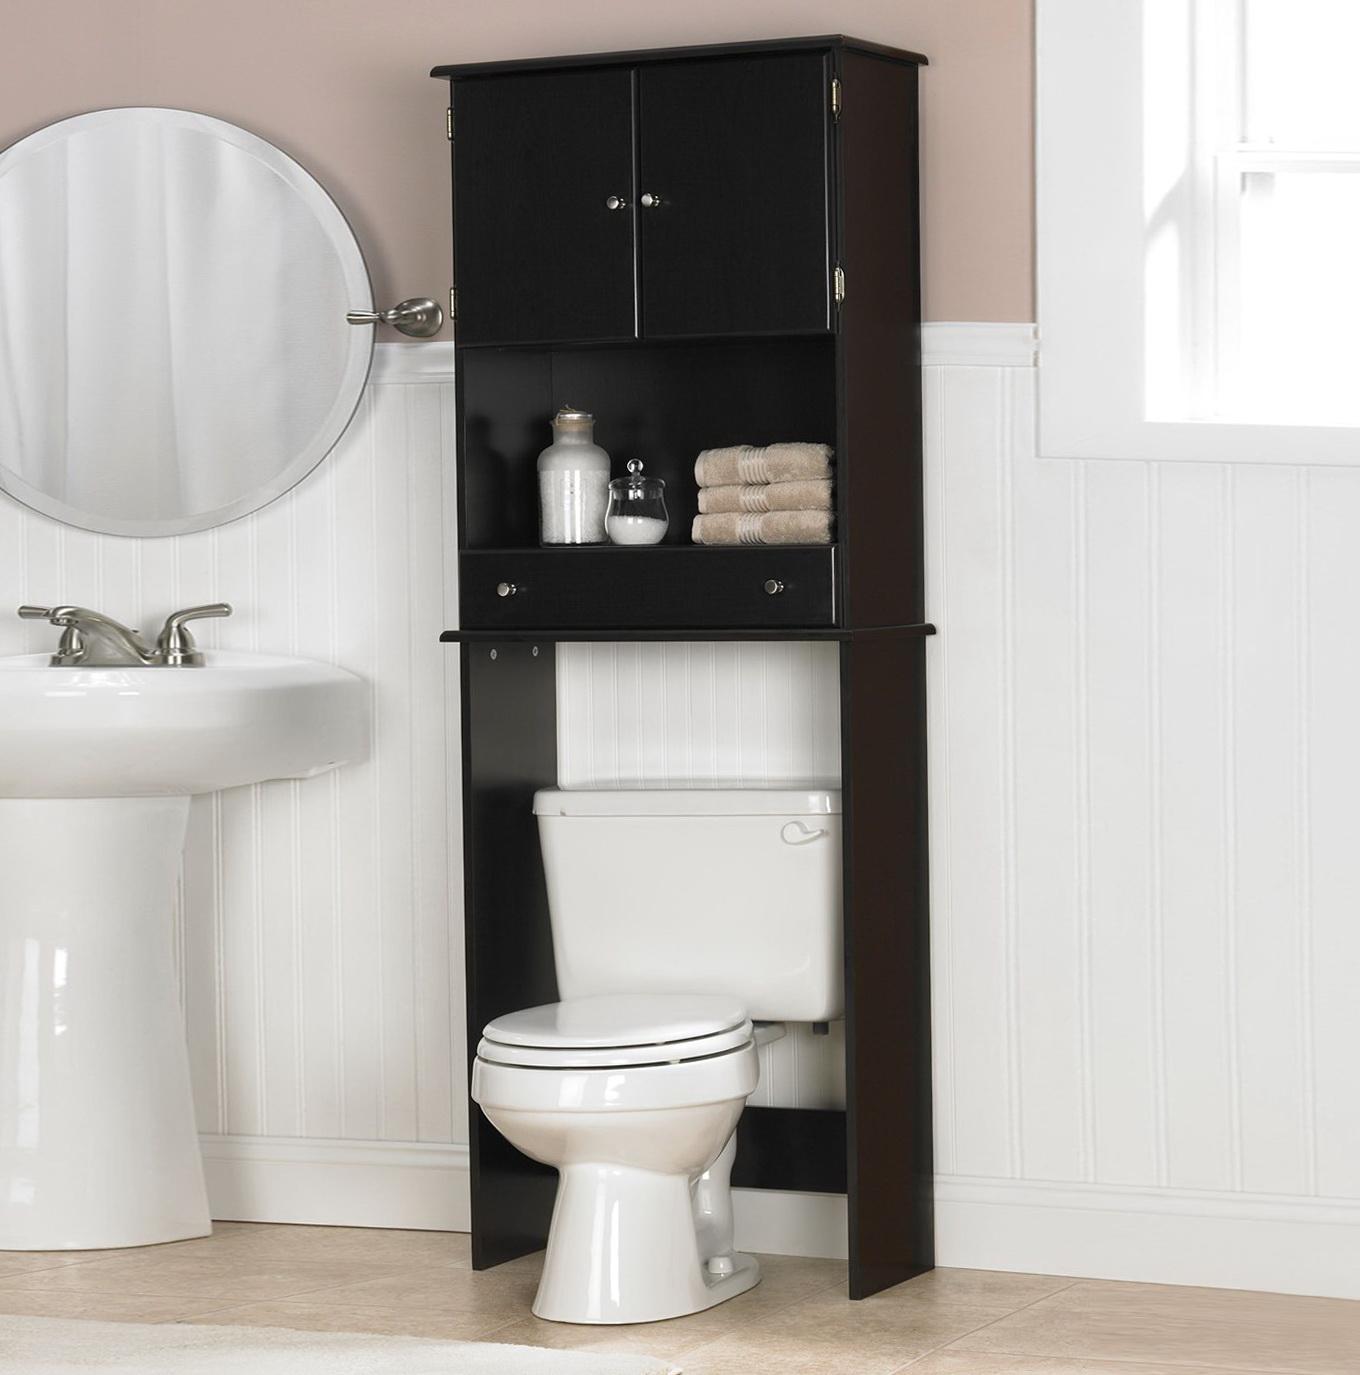 Bathroom Towel Racks Over The Toilet